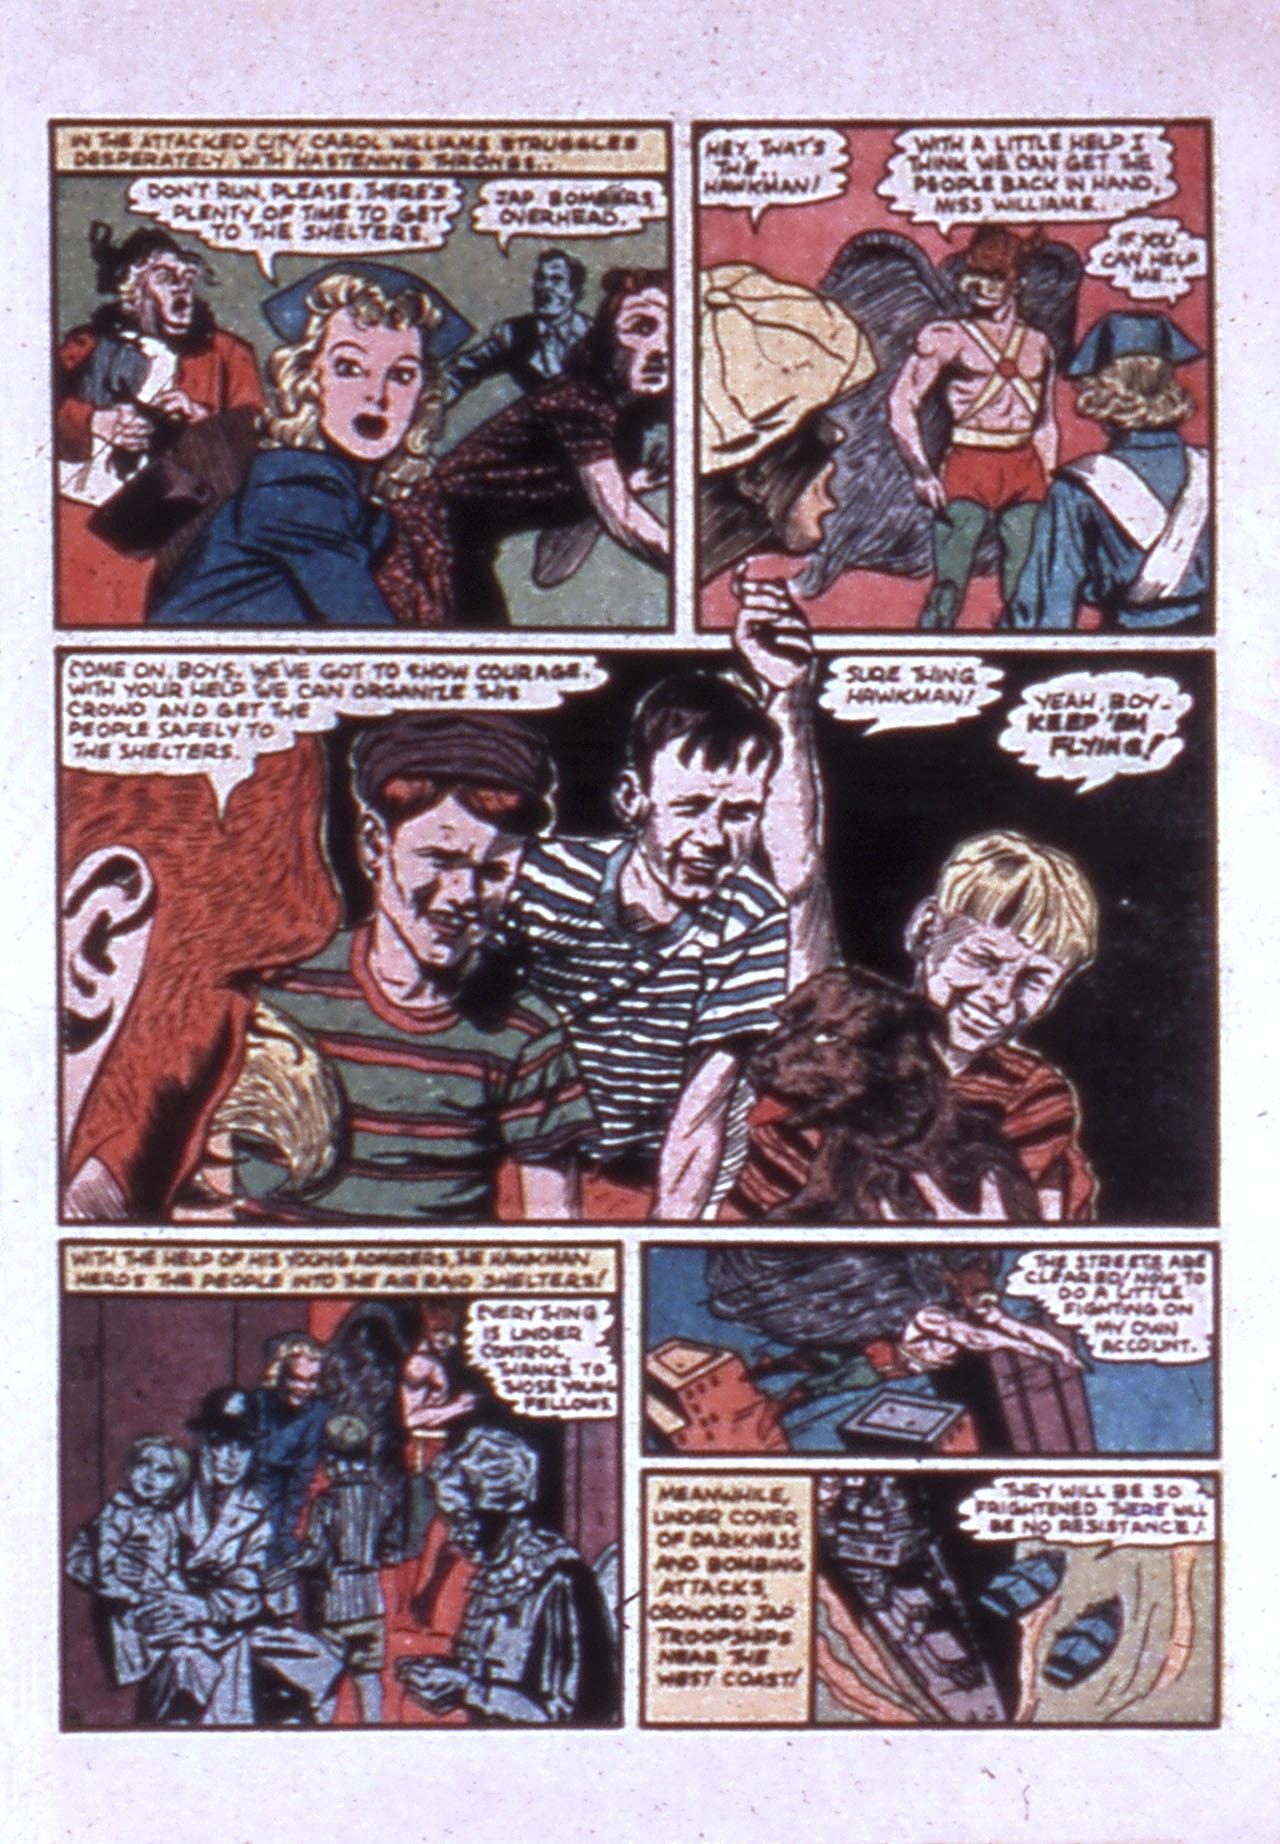 Read online All-Star Comics comic -  Issue #11 - 9